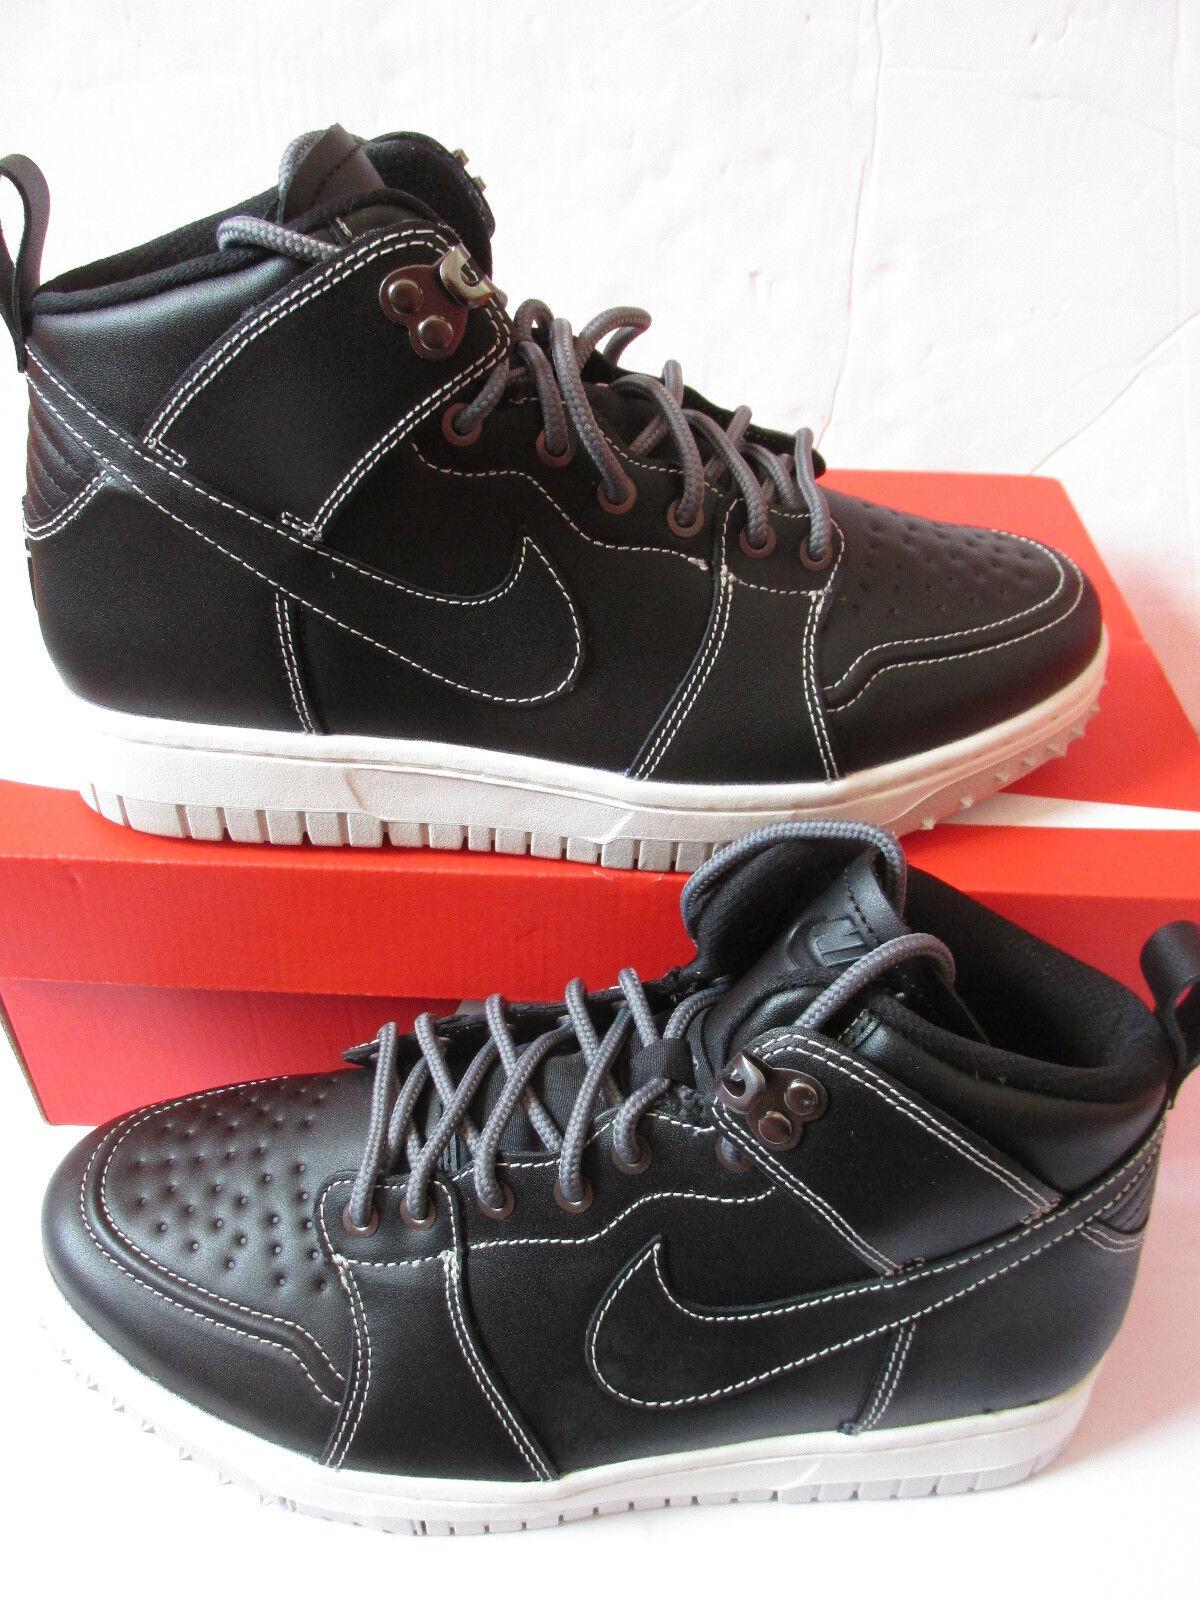 nike dunk 805995 hi top - trainer cmft wb männer 805995 dunk 001 sneakers, schuhe 5cd9f0